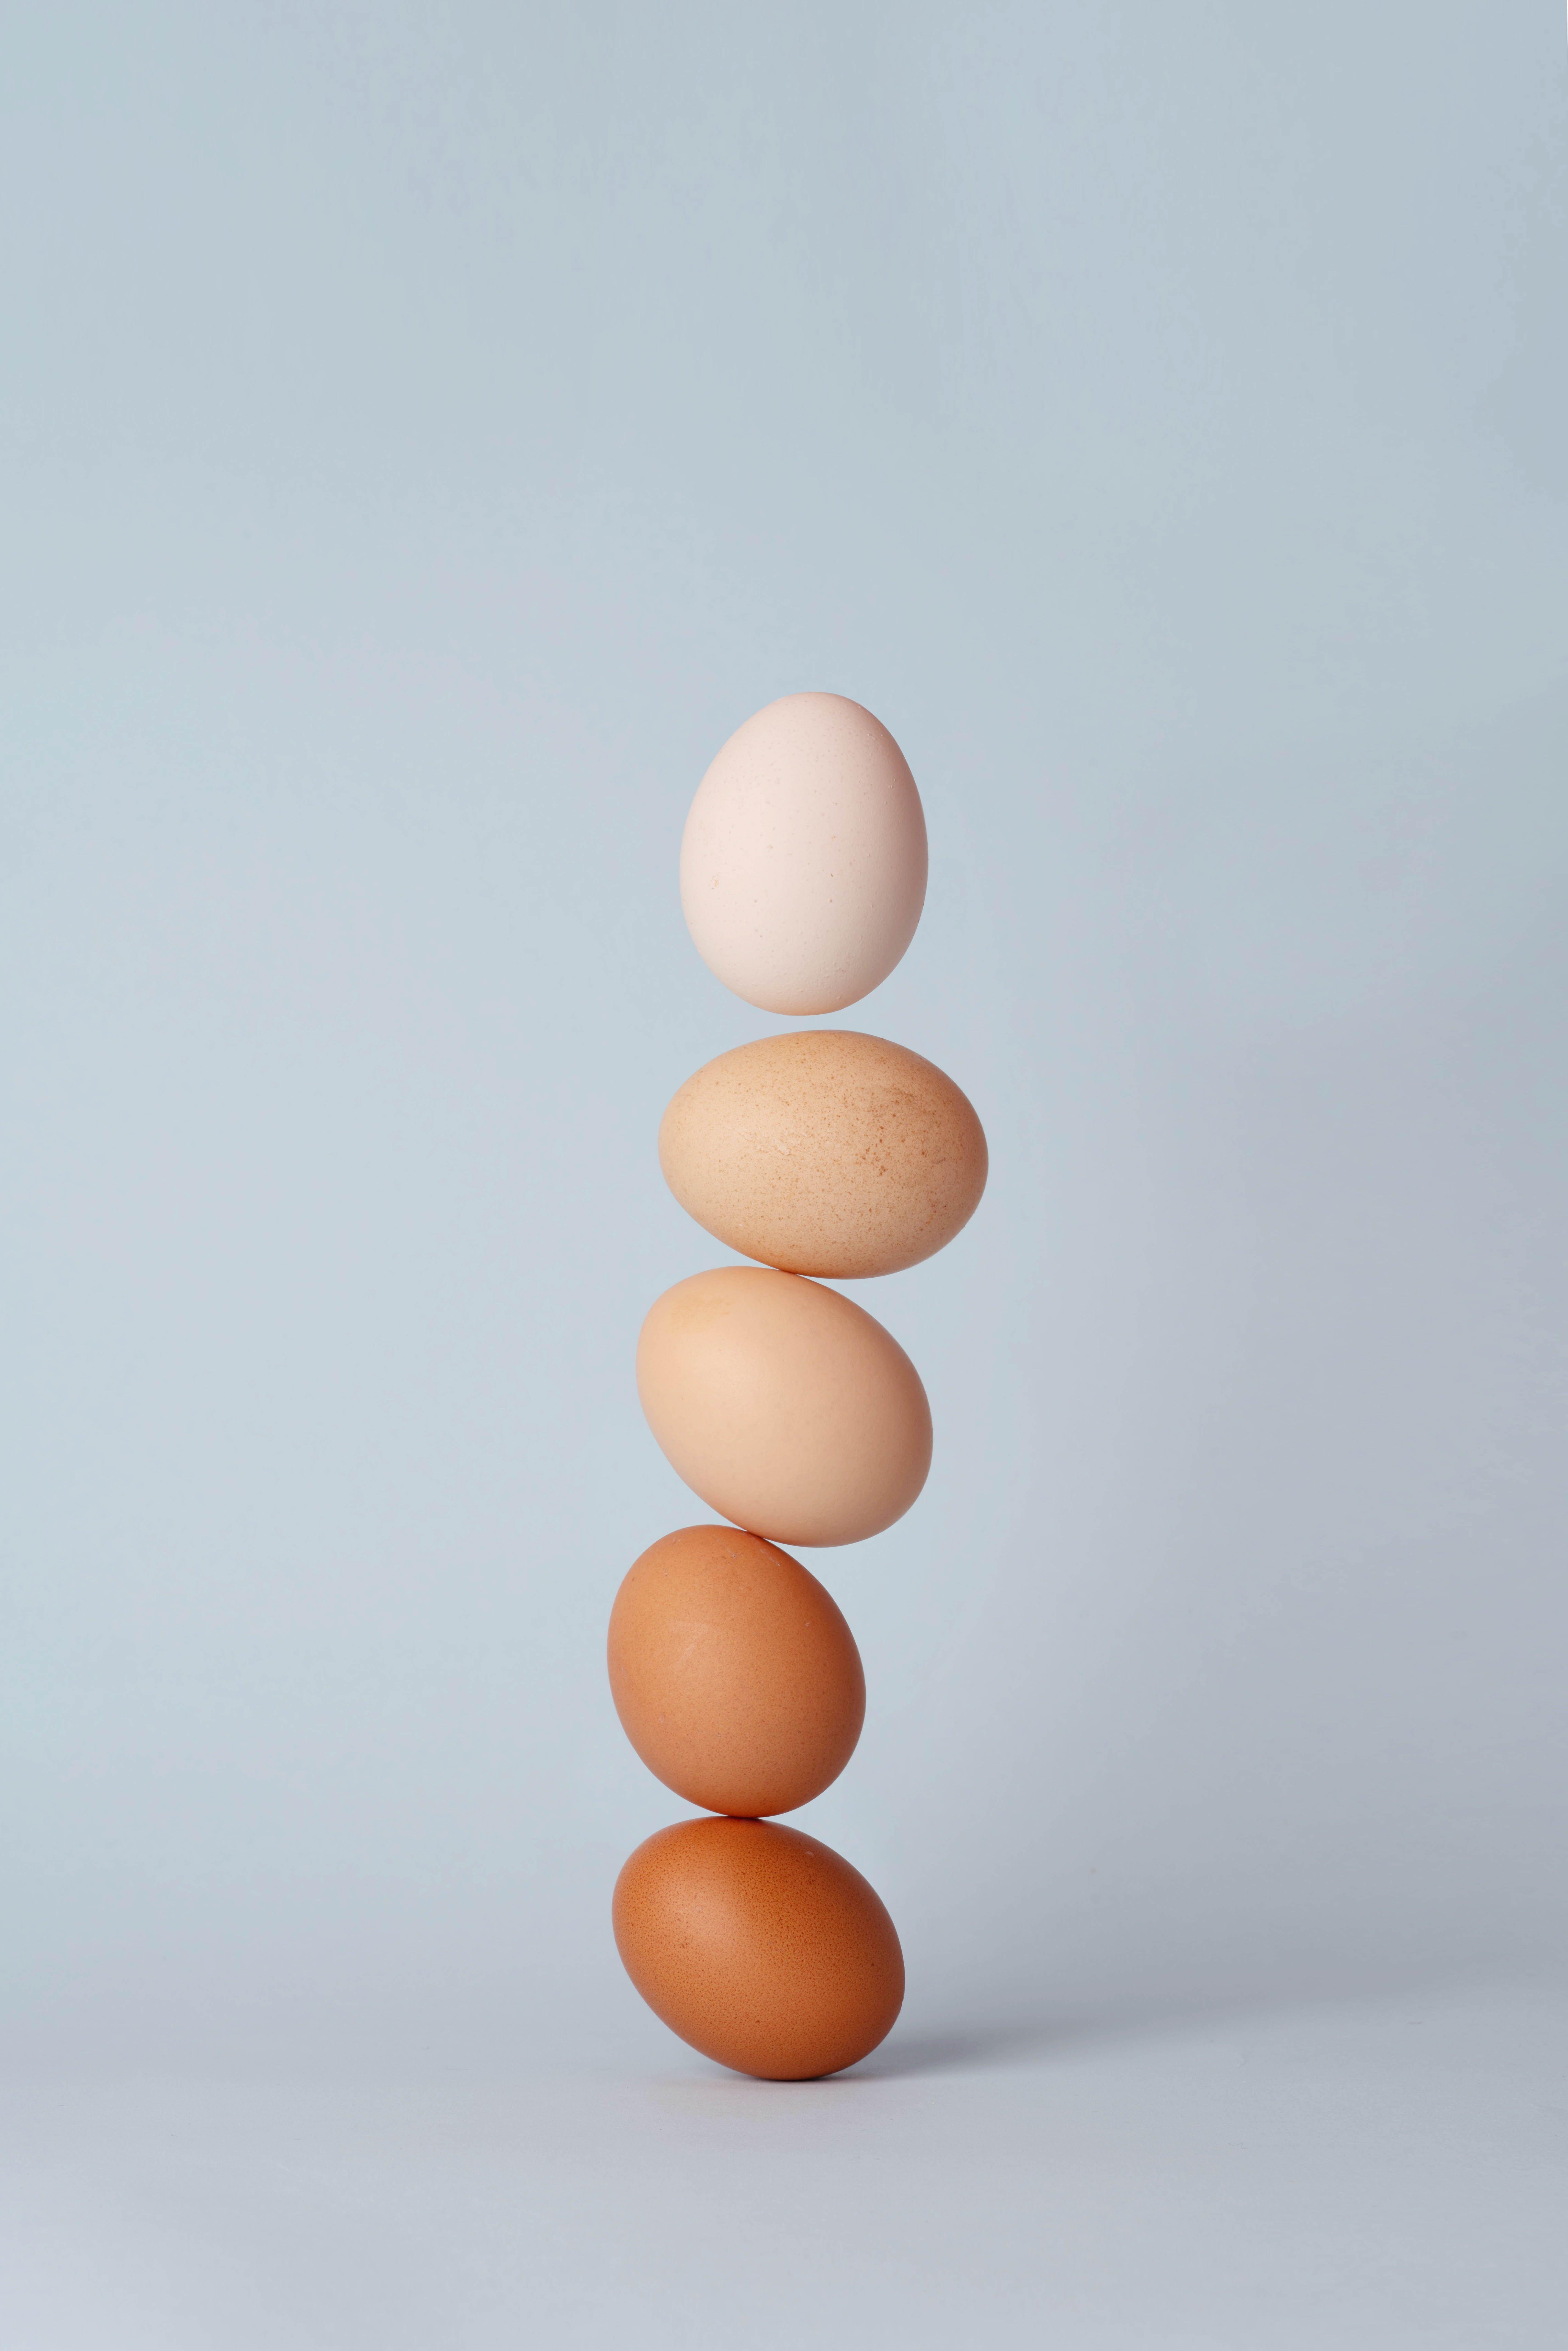 Eggs falling to the ground | Unsplash.com